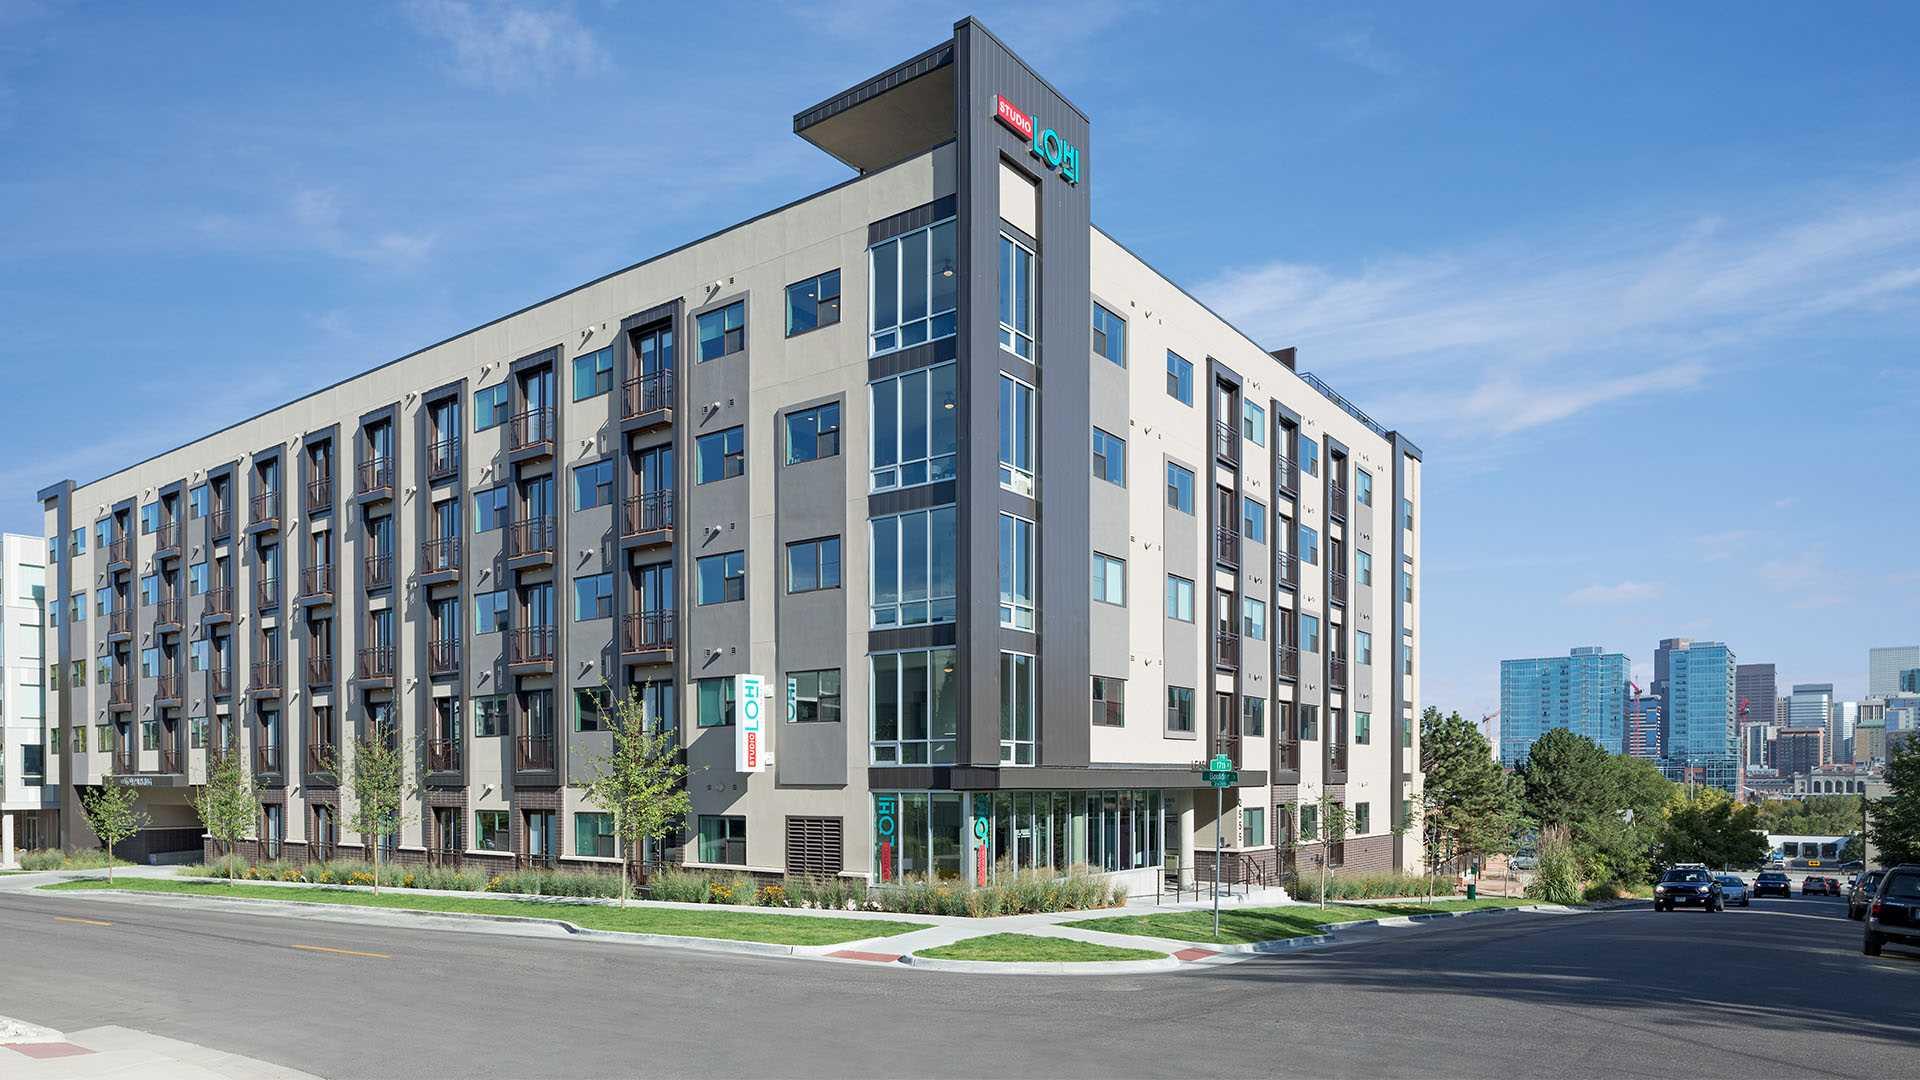 LoHi Apartments in Denver, CO | Studio LoHi